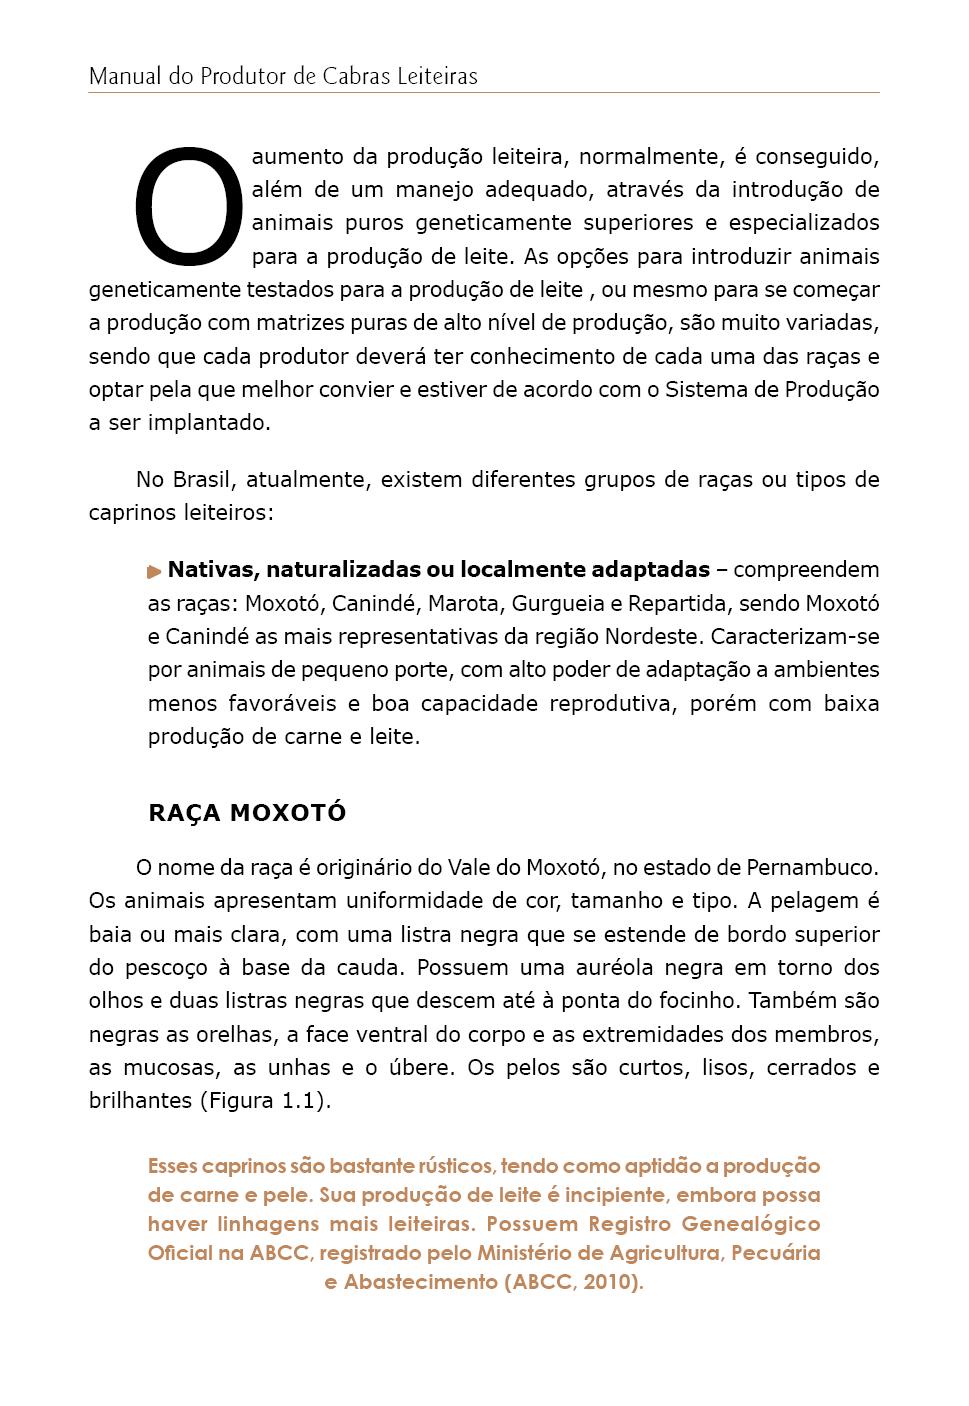 Manual do Produtor de Cabras Leiteiras